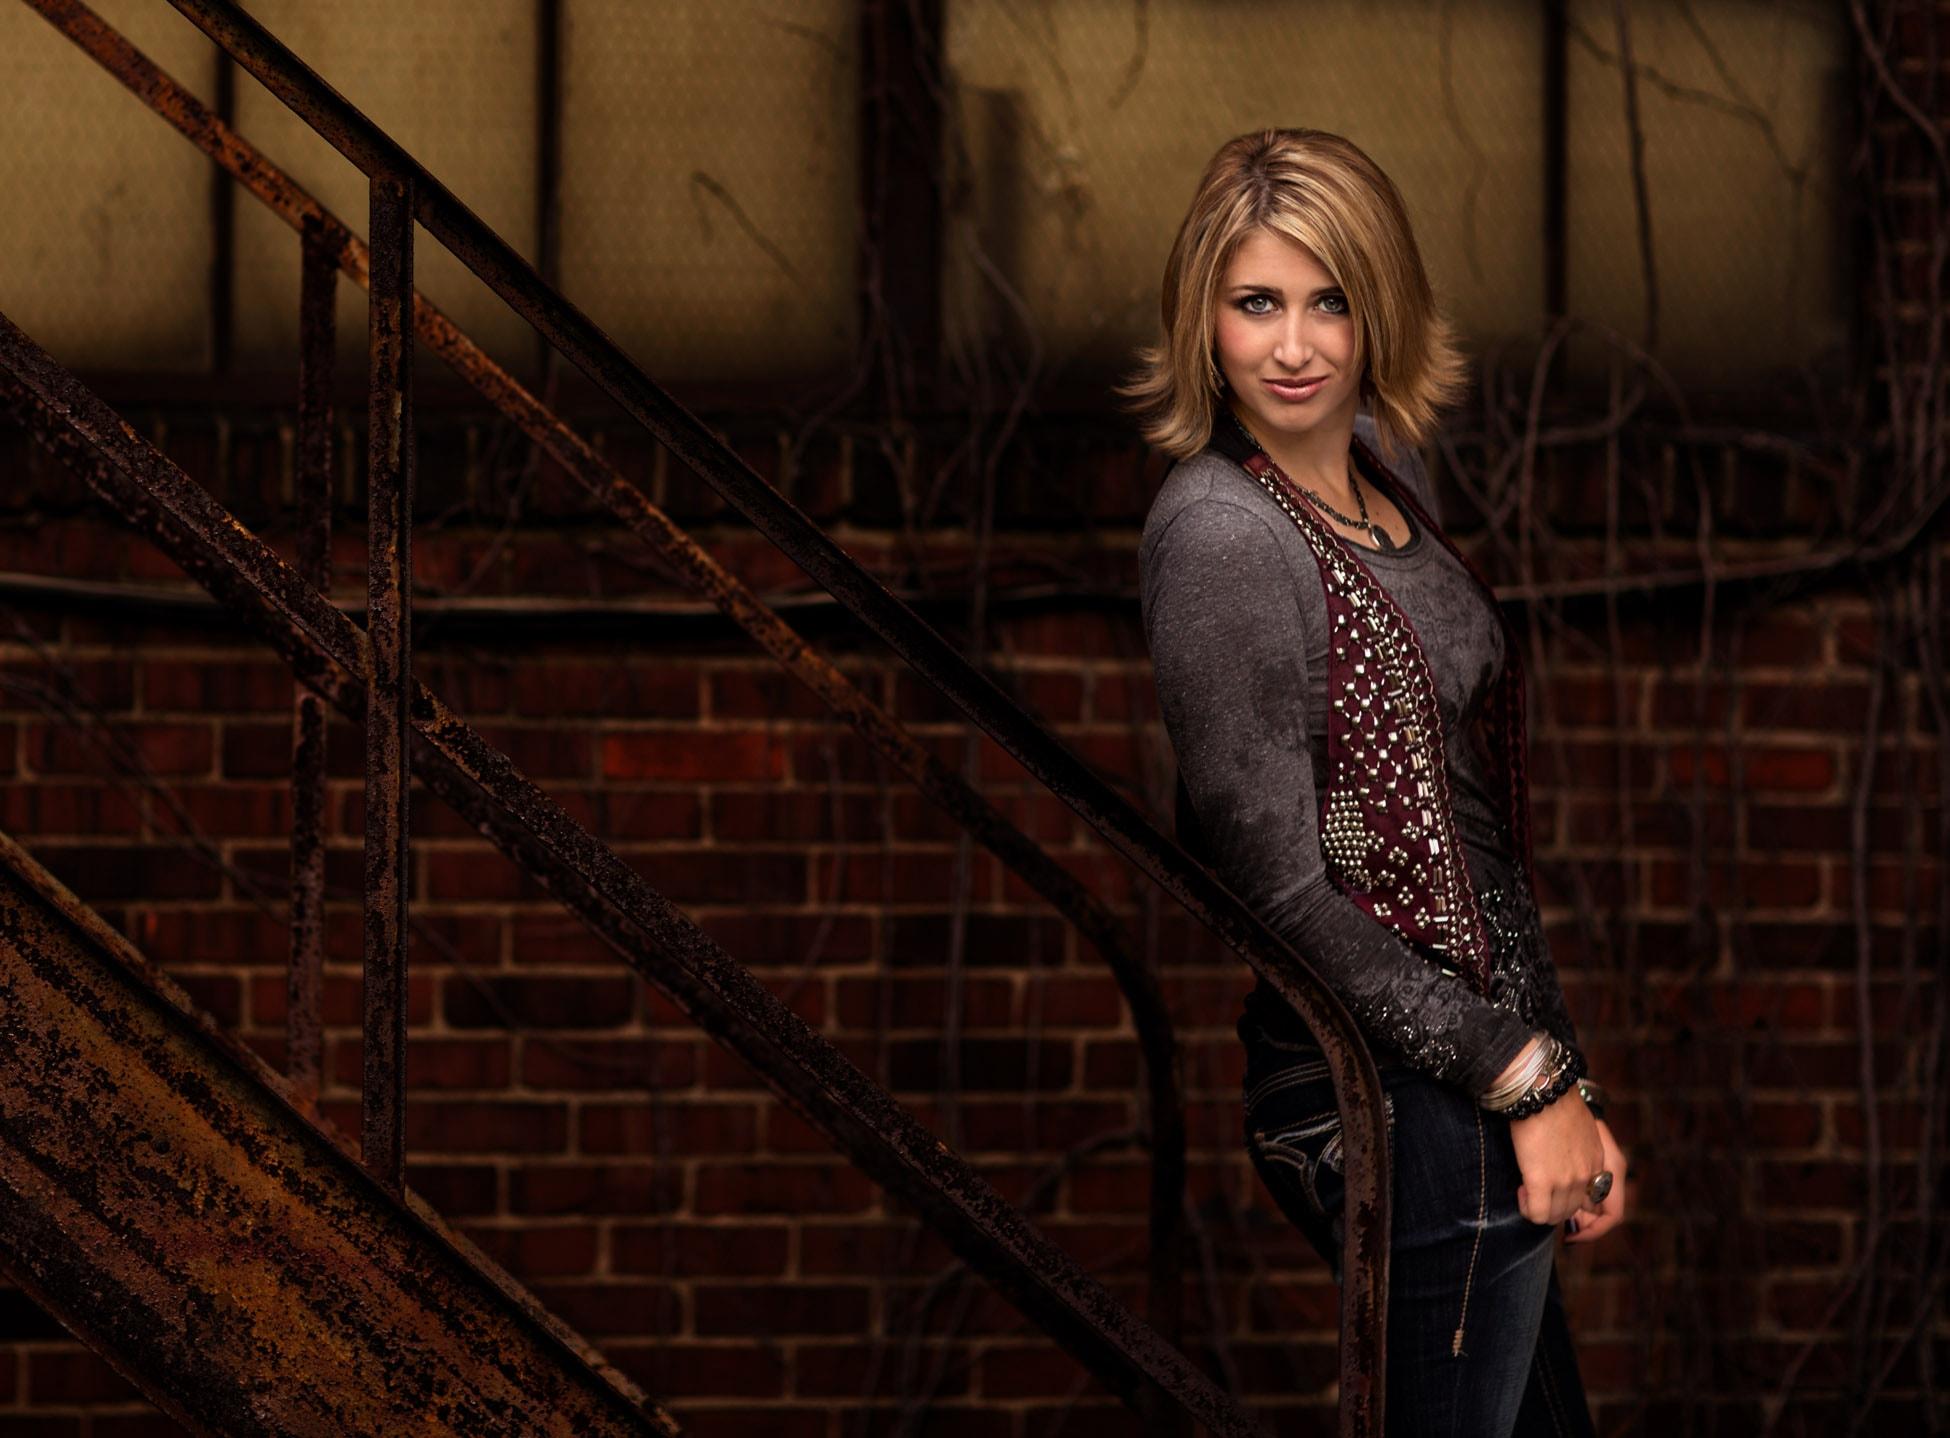 senior portrait photography: Cleveland